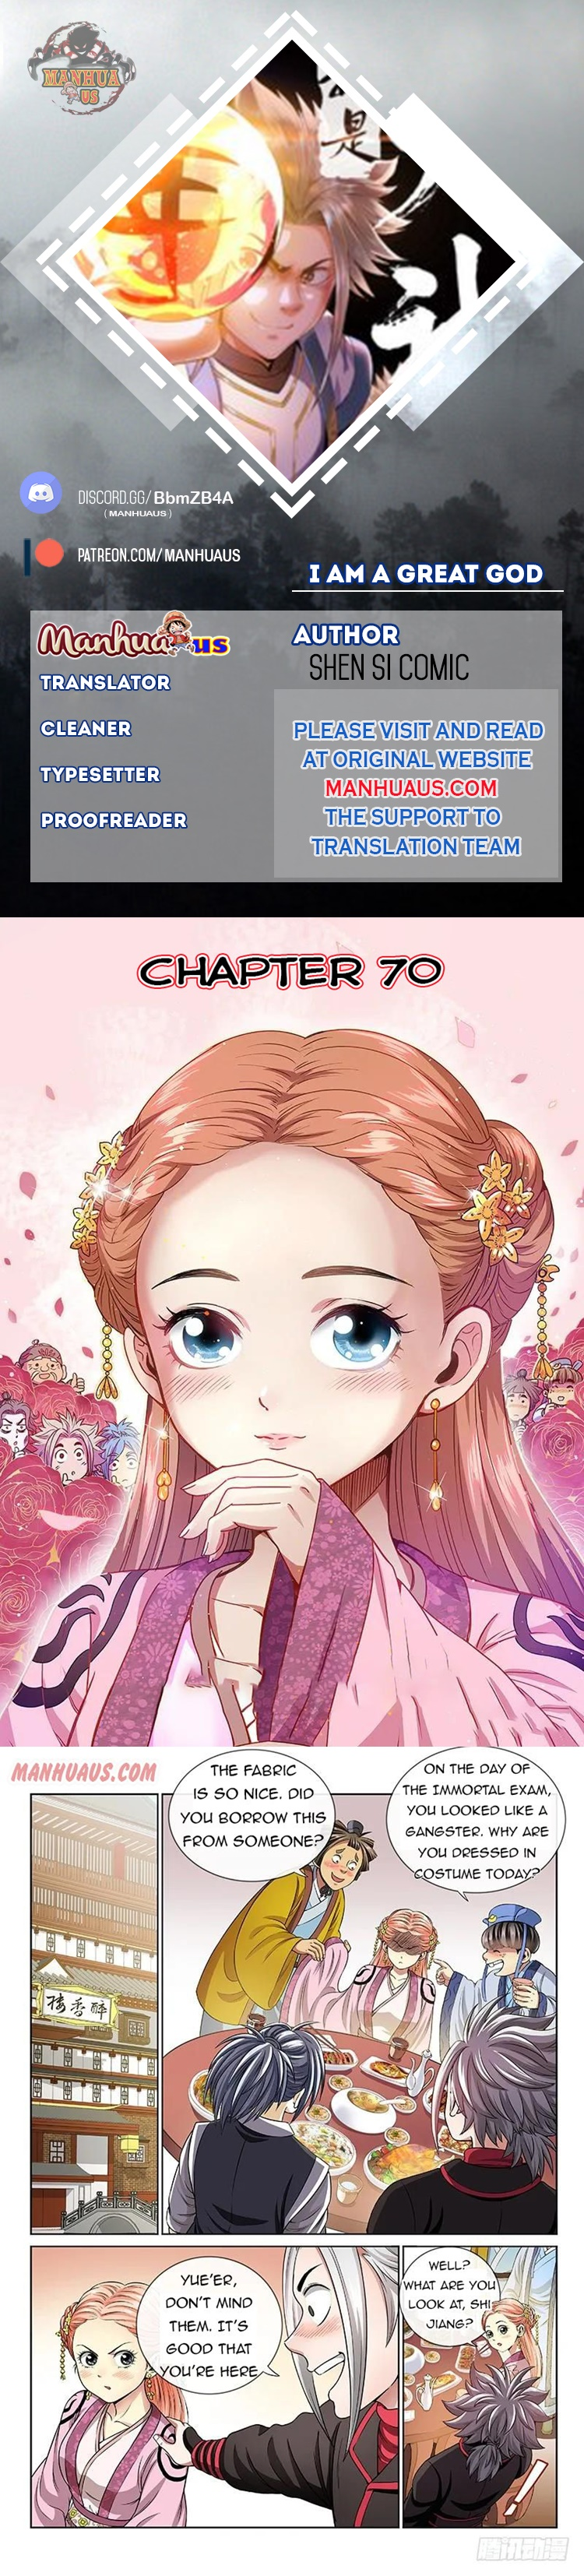 https://manga.mangadogs.com/comics/pic4/4/21124/2823101/0765300372d04032ca2d6d8b4ae35e63.jpg Page 1